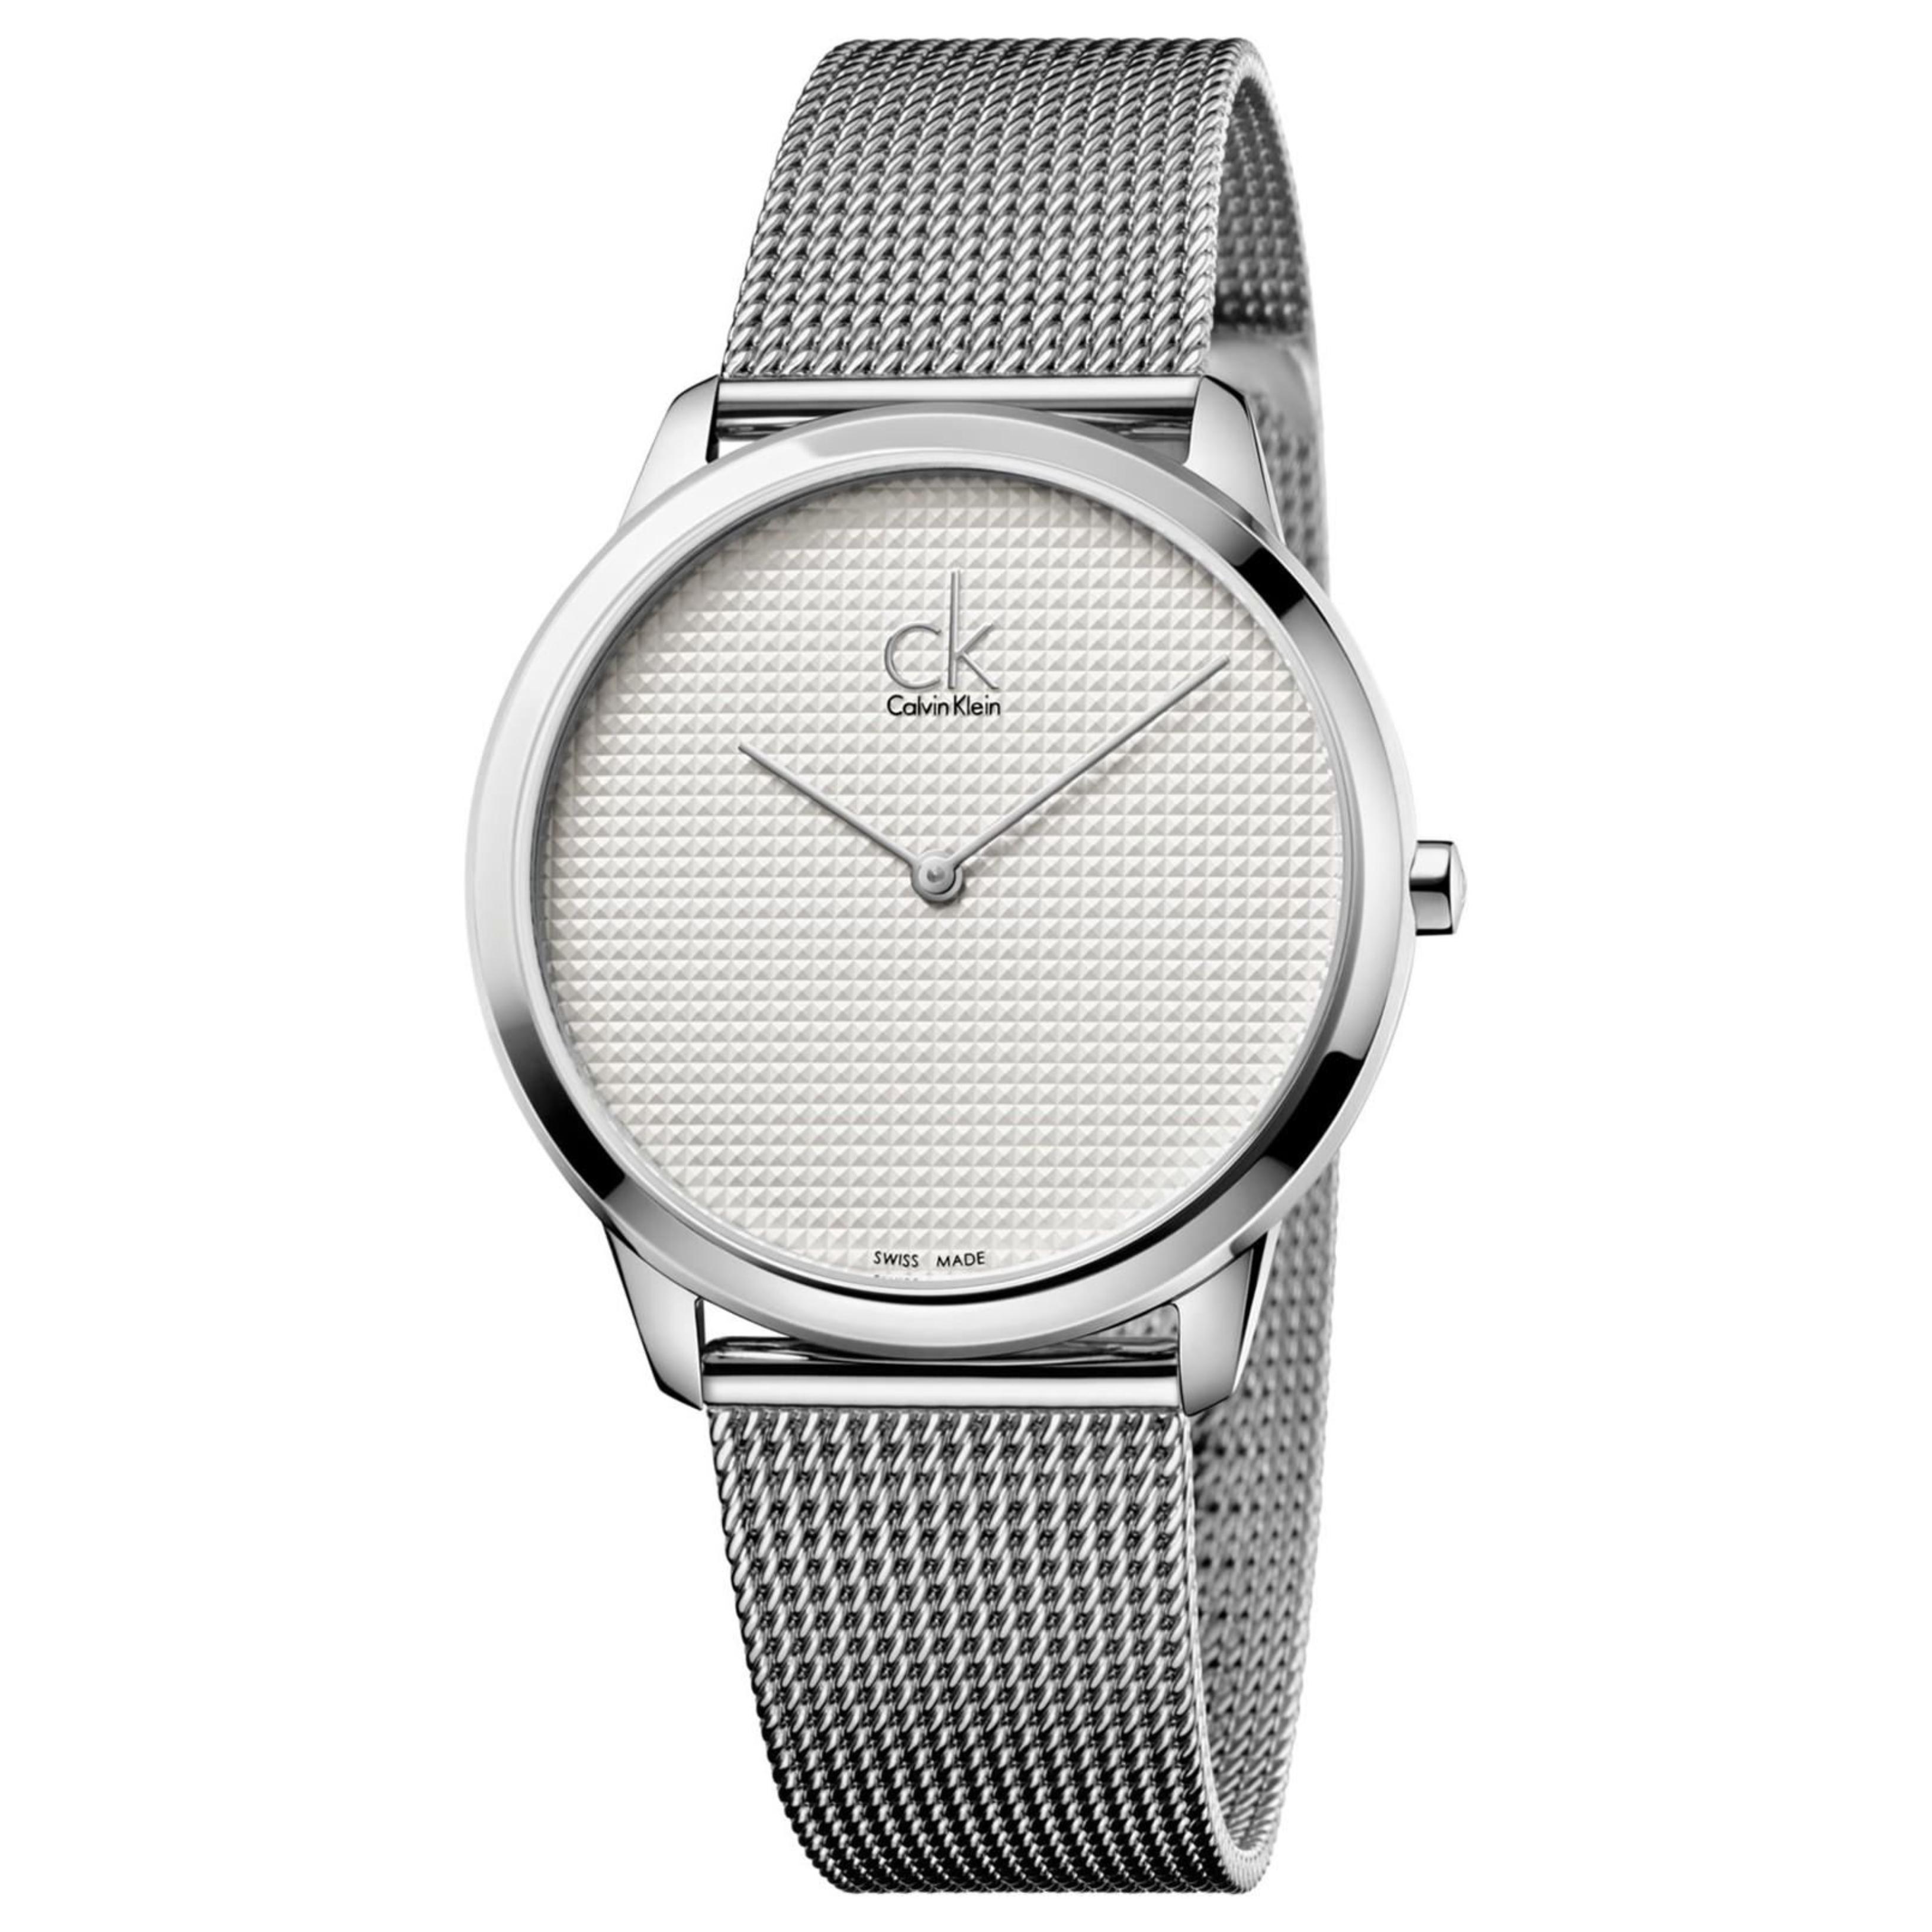 Calvin Klein Minimal Men's Watch K3M2112Y | Silver Dial | Stainless Steel Mesh Strap